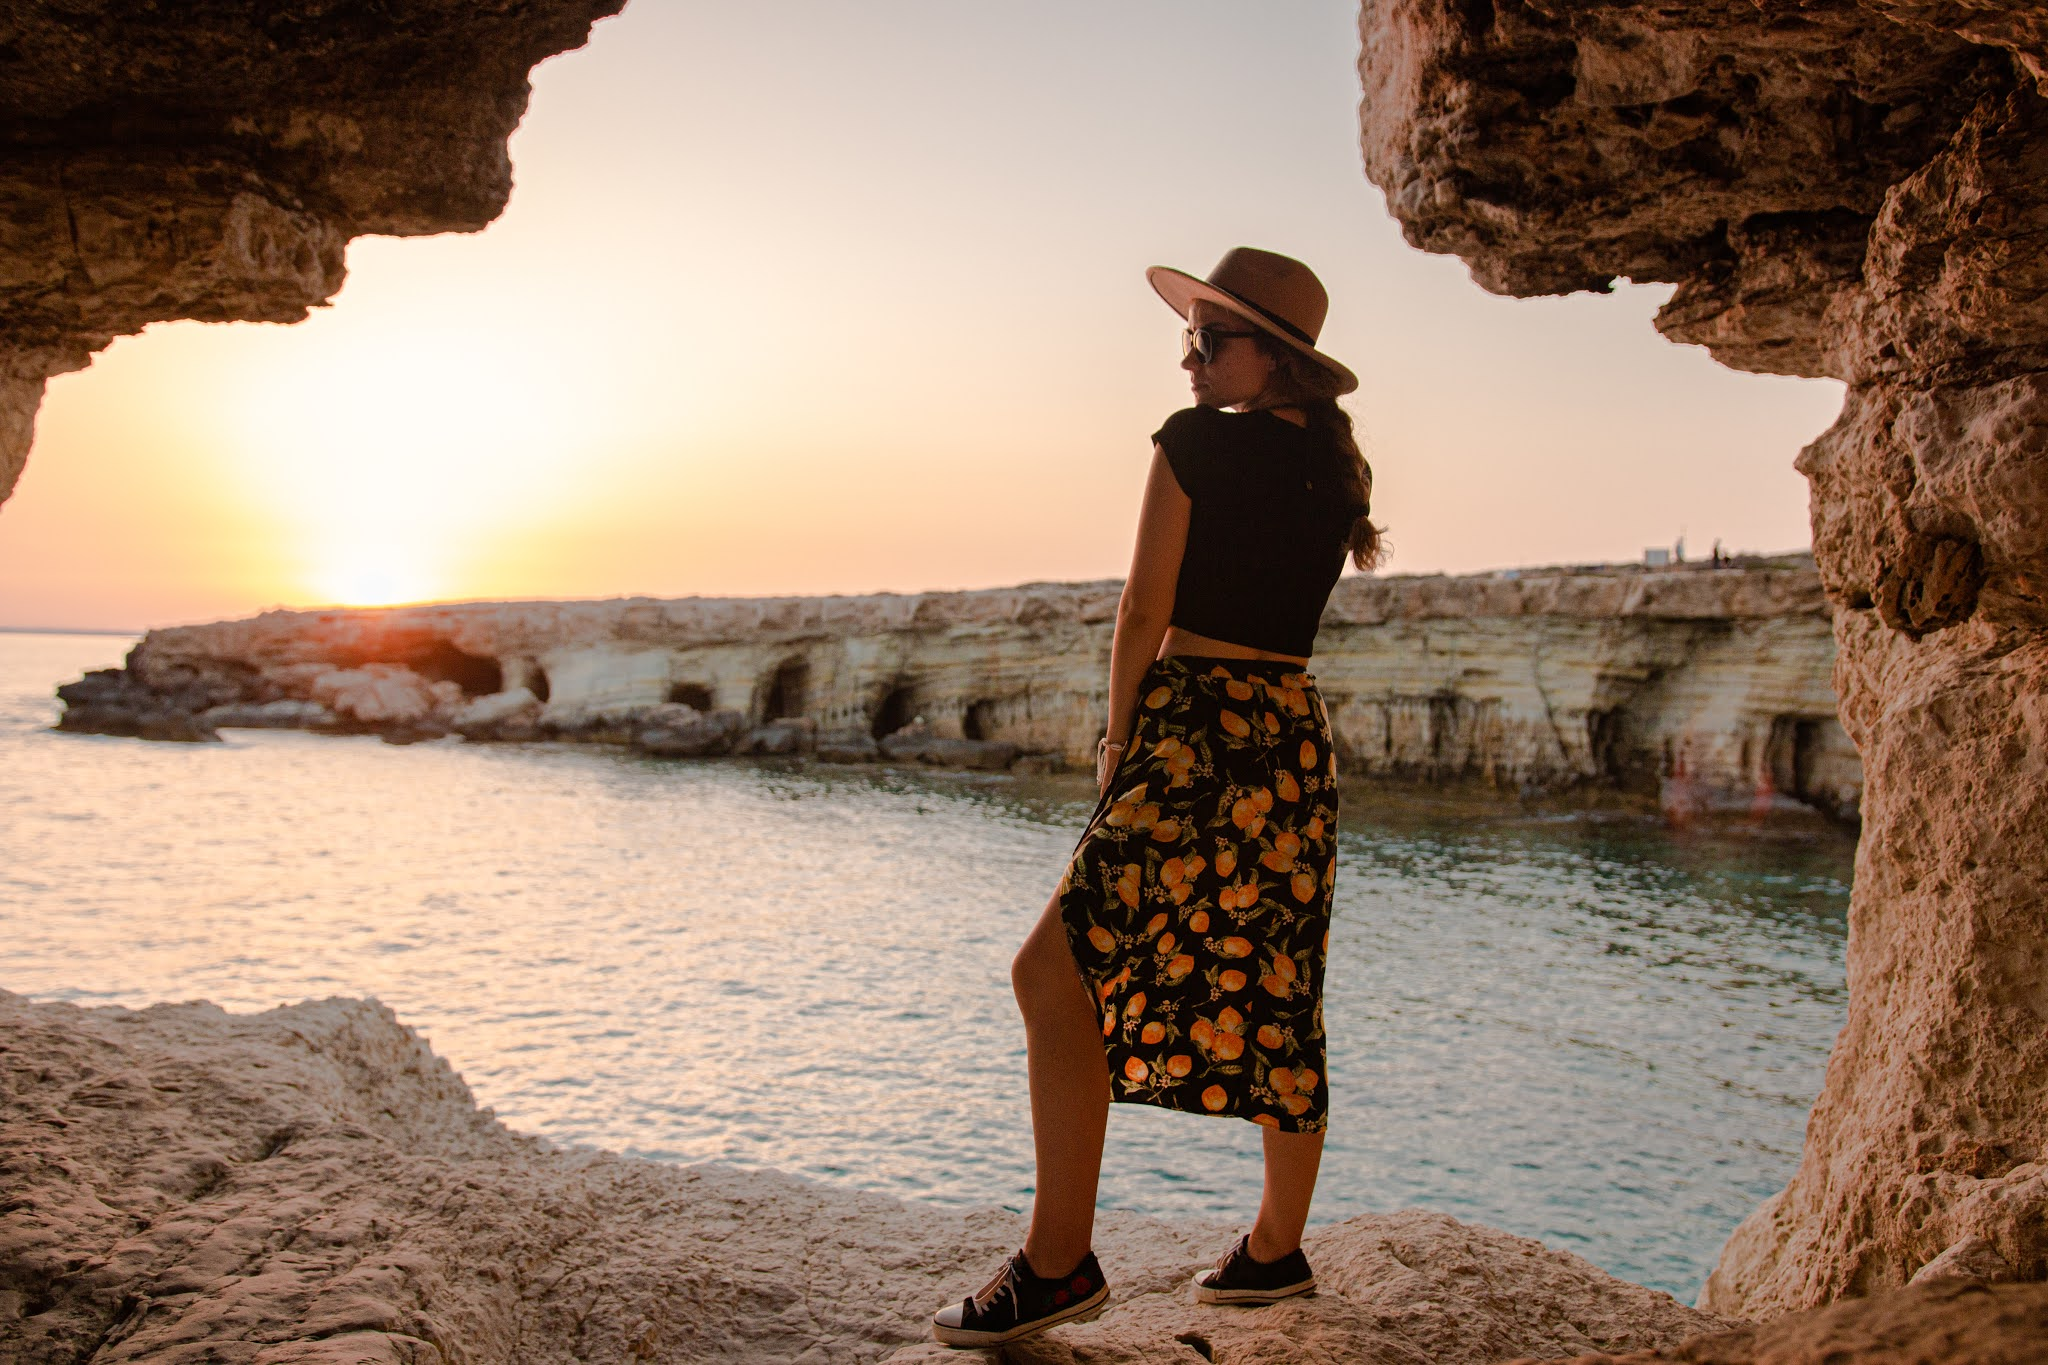 Sea Caves, Cypr, klify, i jaskinie morskie